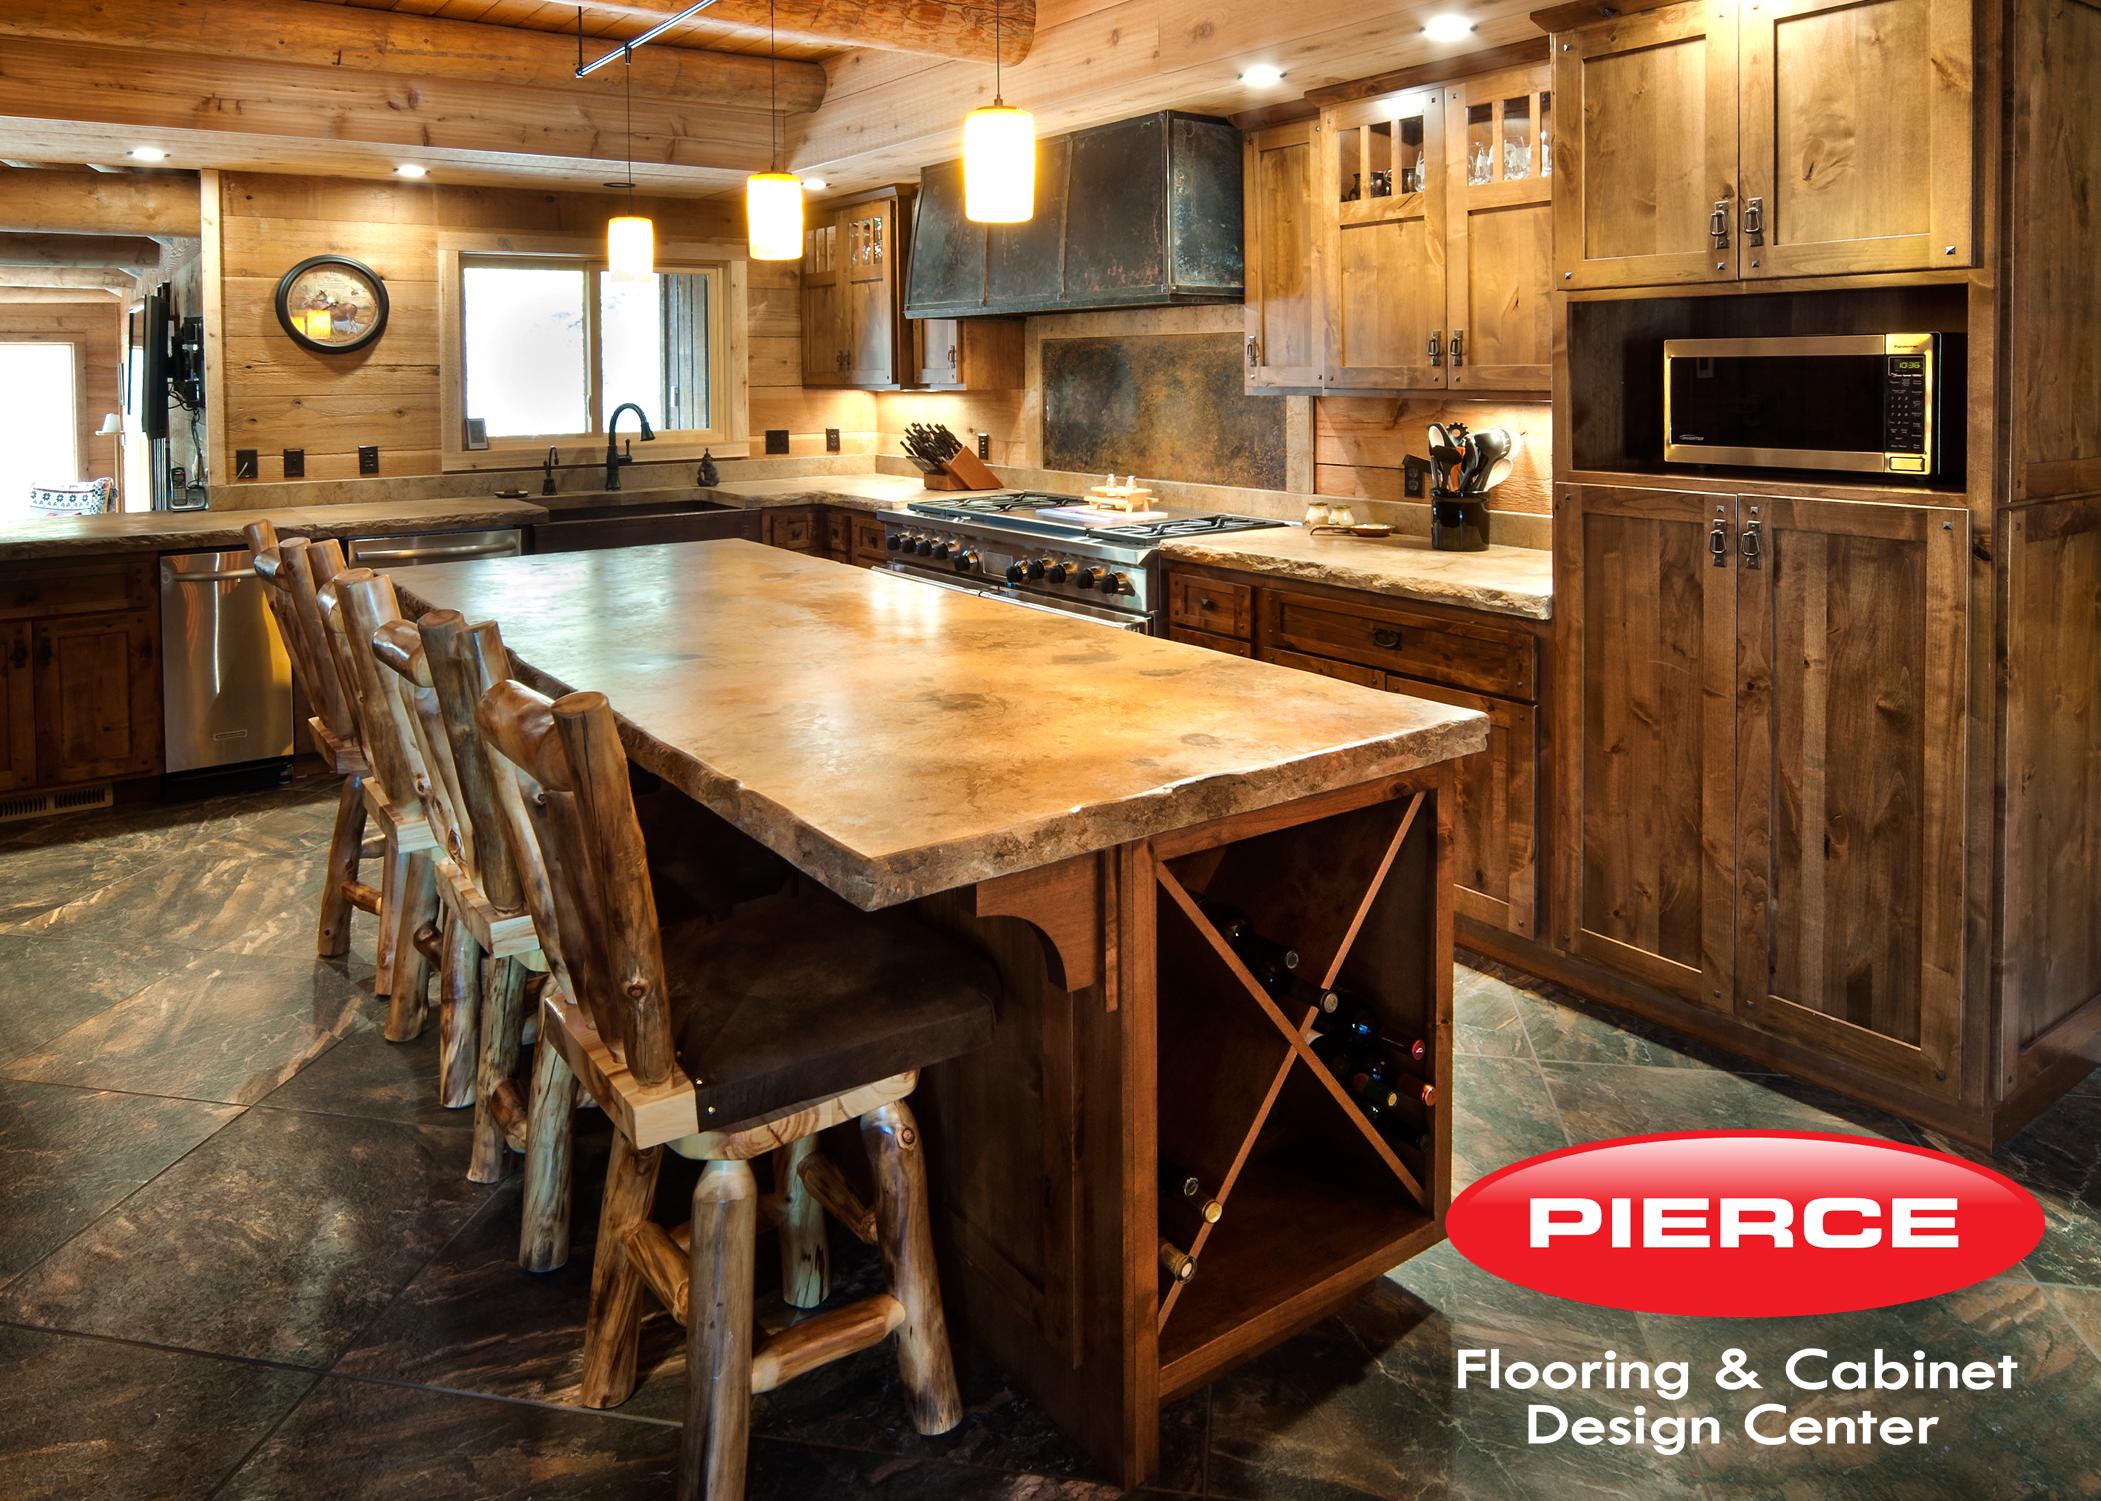 Pierce Flooring Cabinet Design 2950 King Ave W Ste 3 Billings Mt 59102 Yp Com